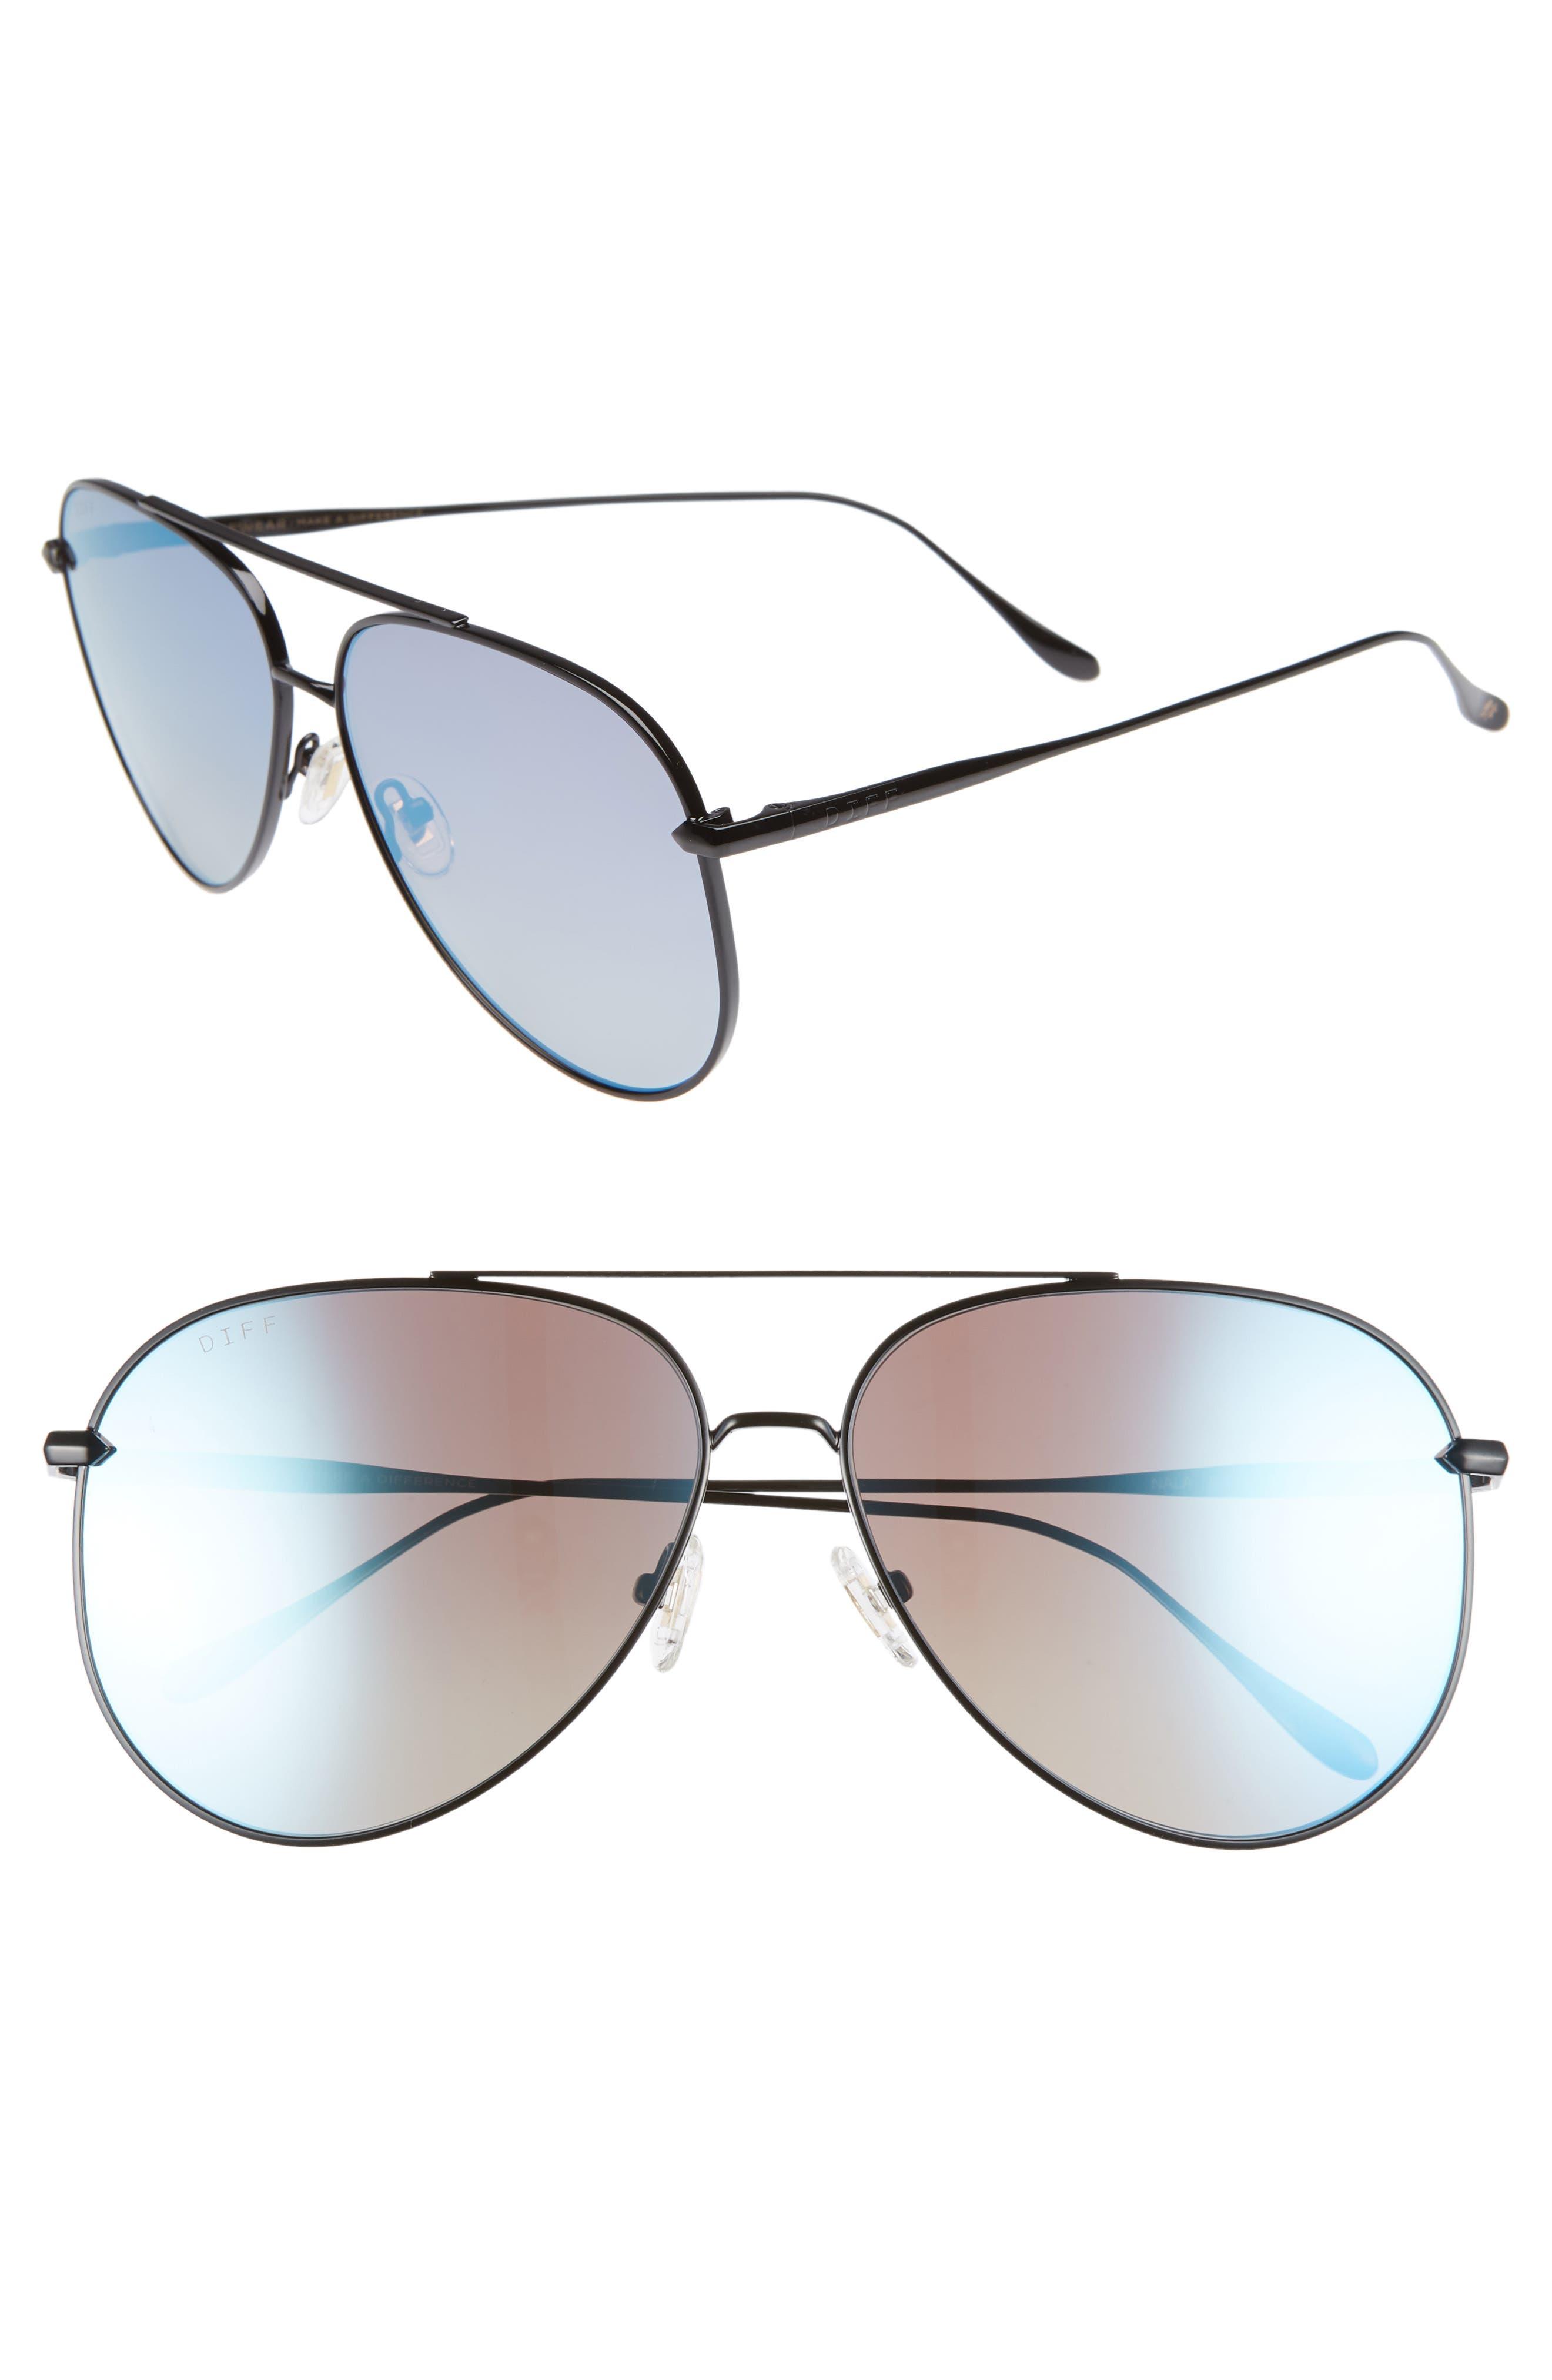 Nala 60mm Polarized Aviator Sunglasses,                             Main thumbnail 1, color,                             BLACK/ SMOKE